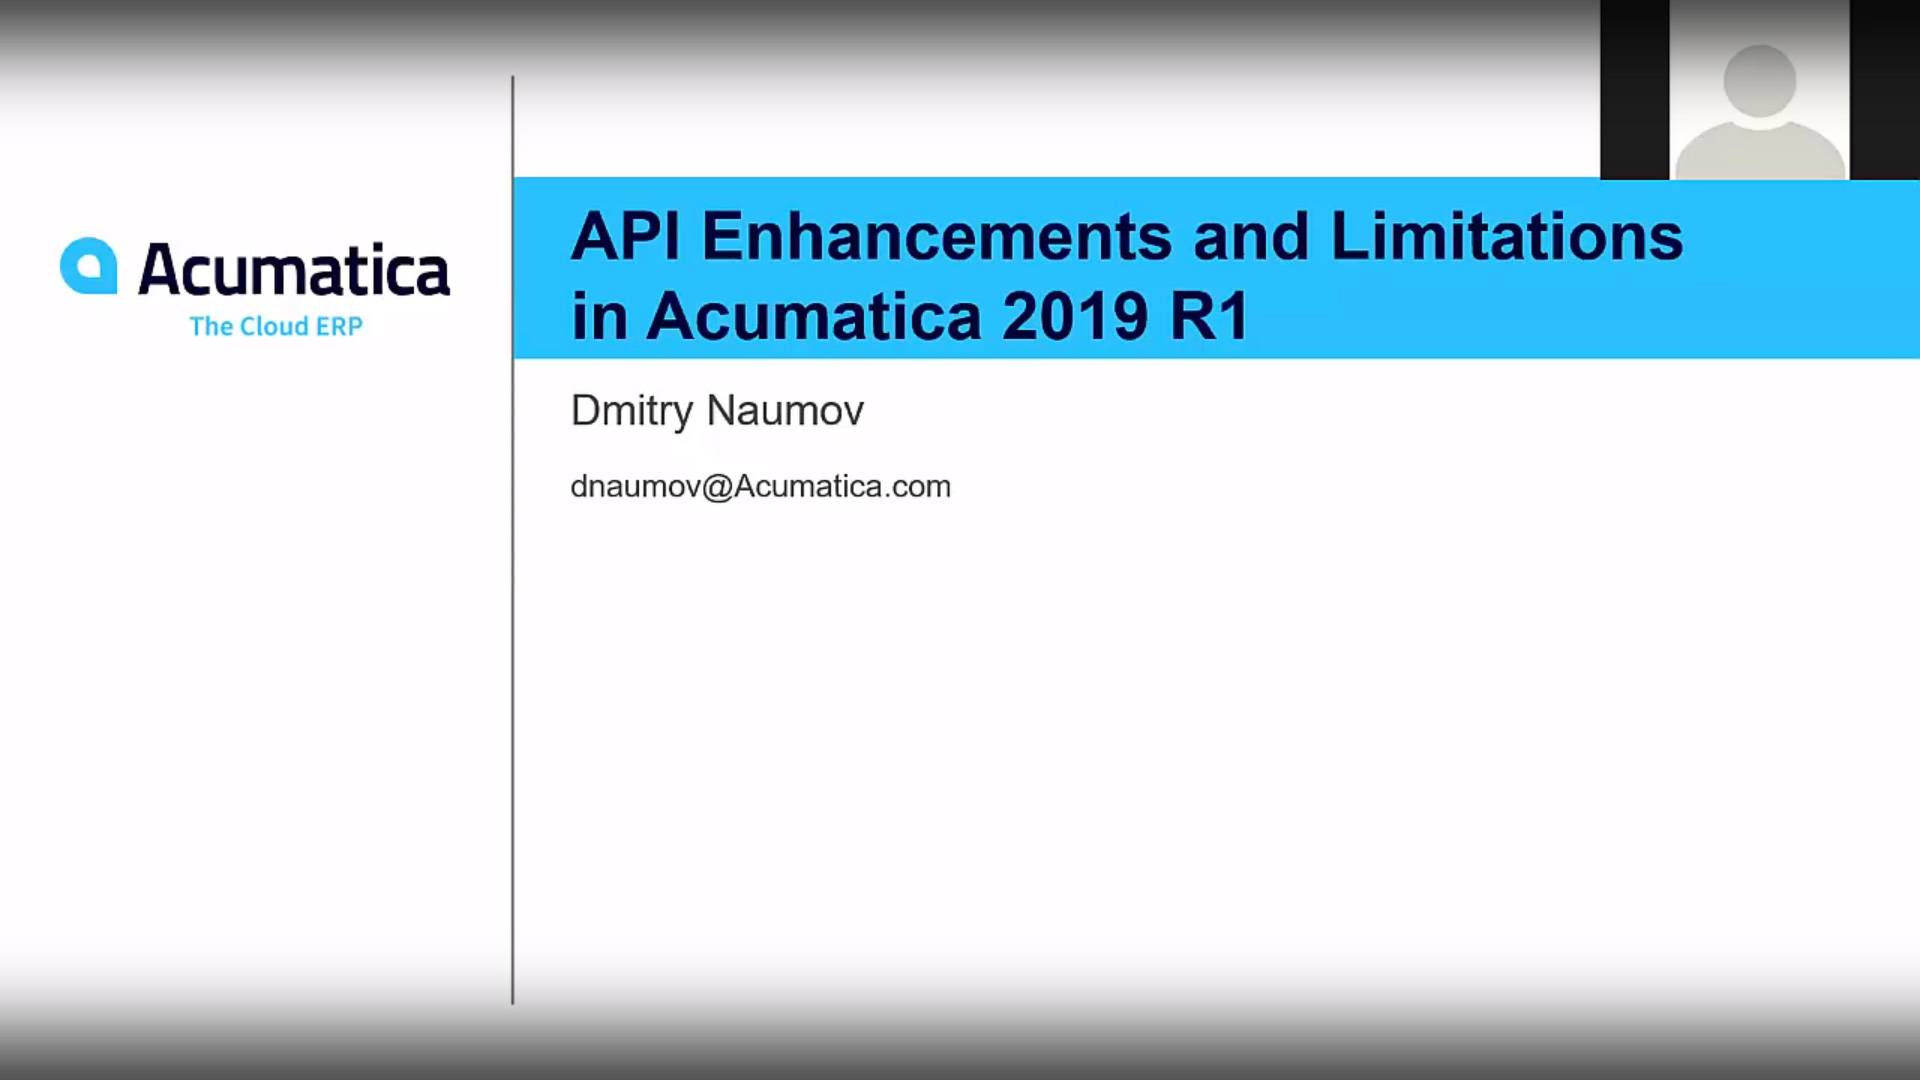 Acumatica Developer Webinar Series: API Enhancements and Limitations